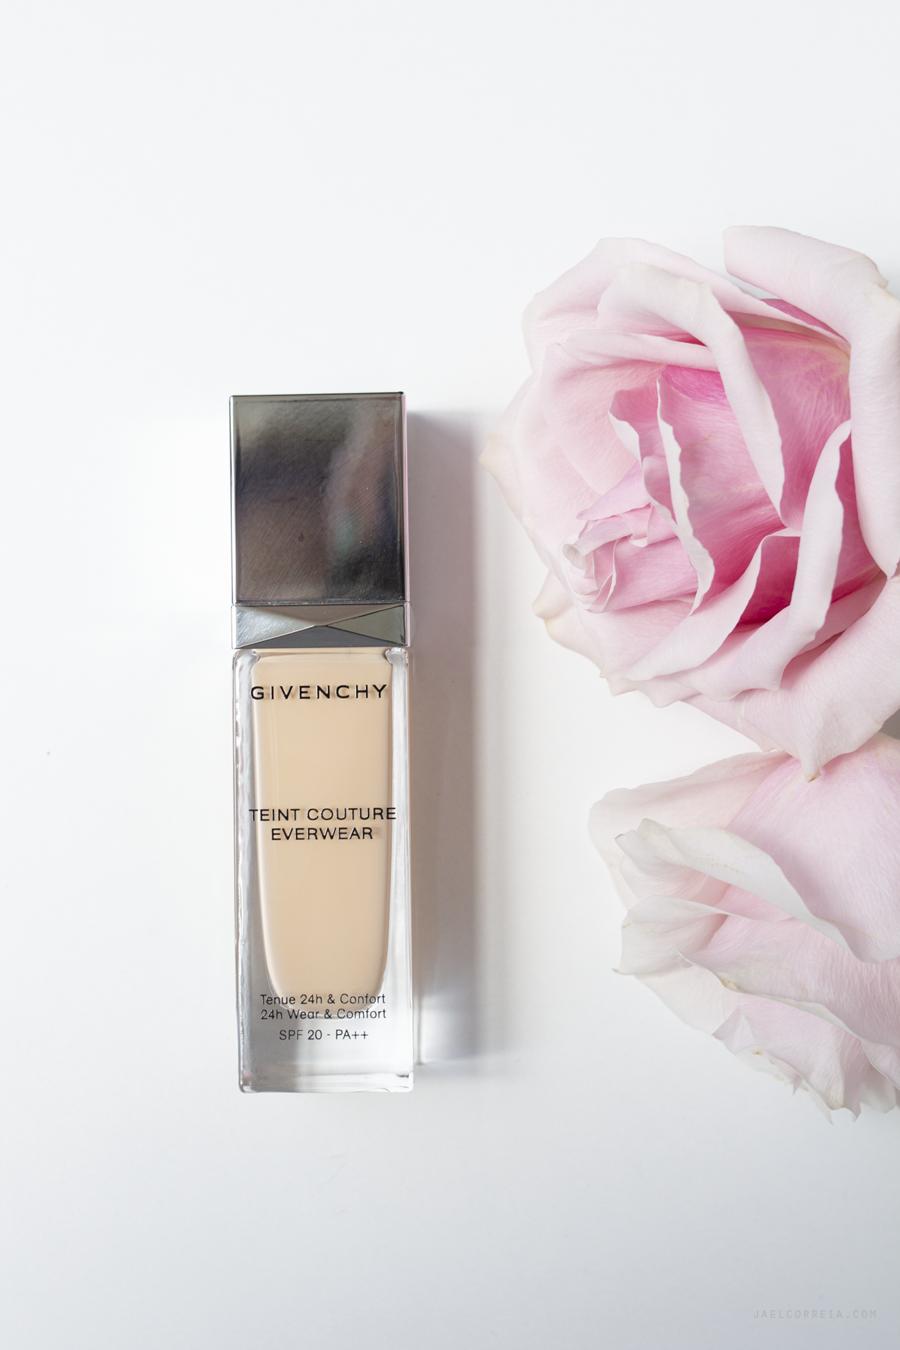 base foundation givenchy teint couture everwear Y105 portugal notino compras online barata perfumaria luxo outlet jael correia 2